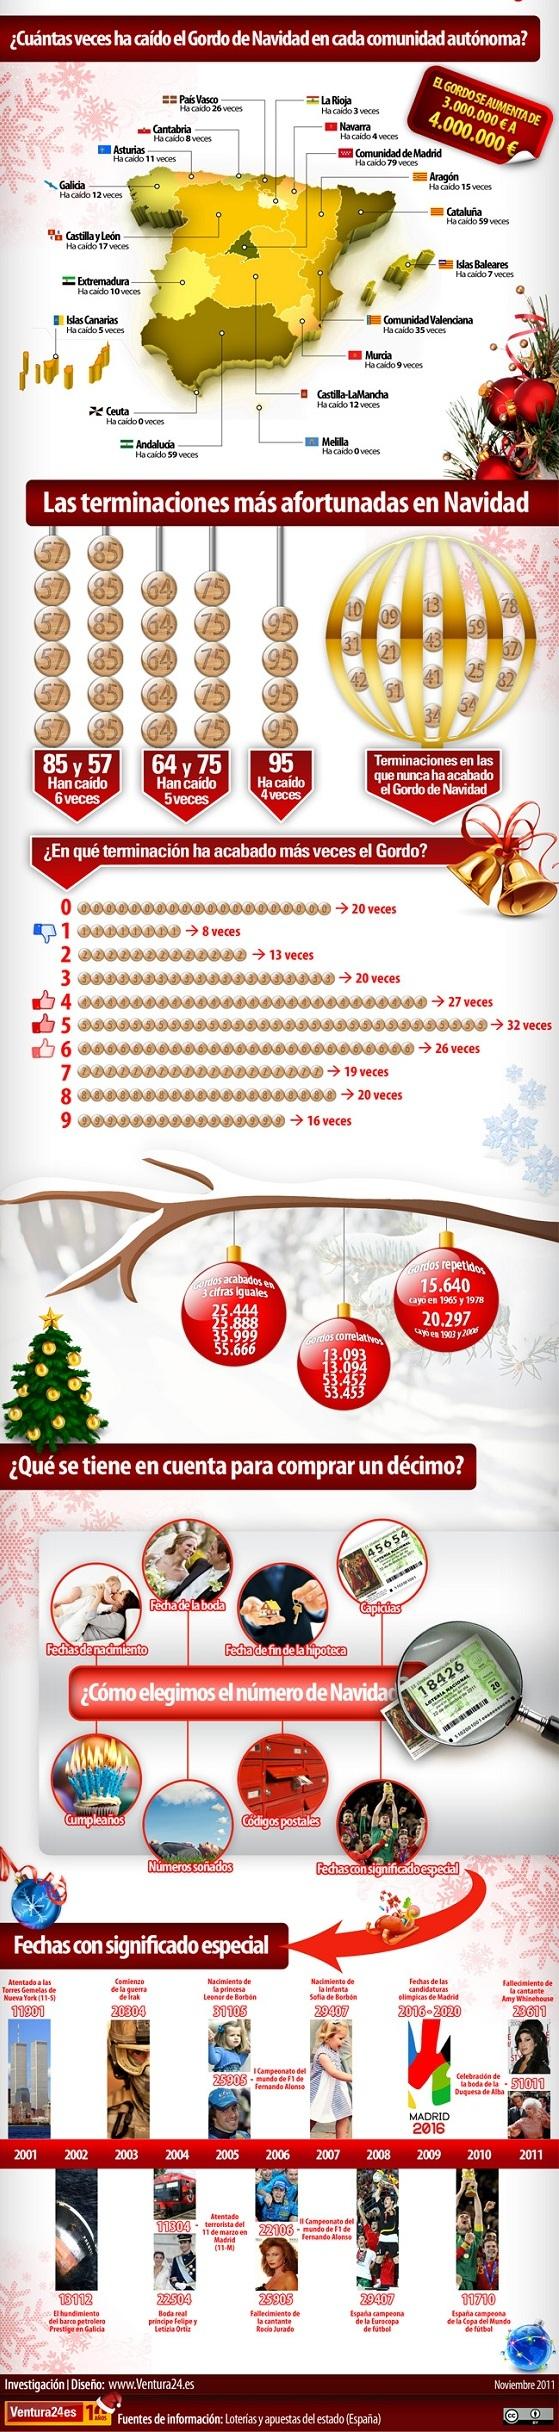 imagenes loteria navidad 2011